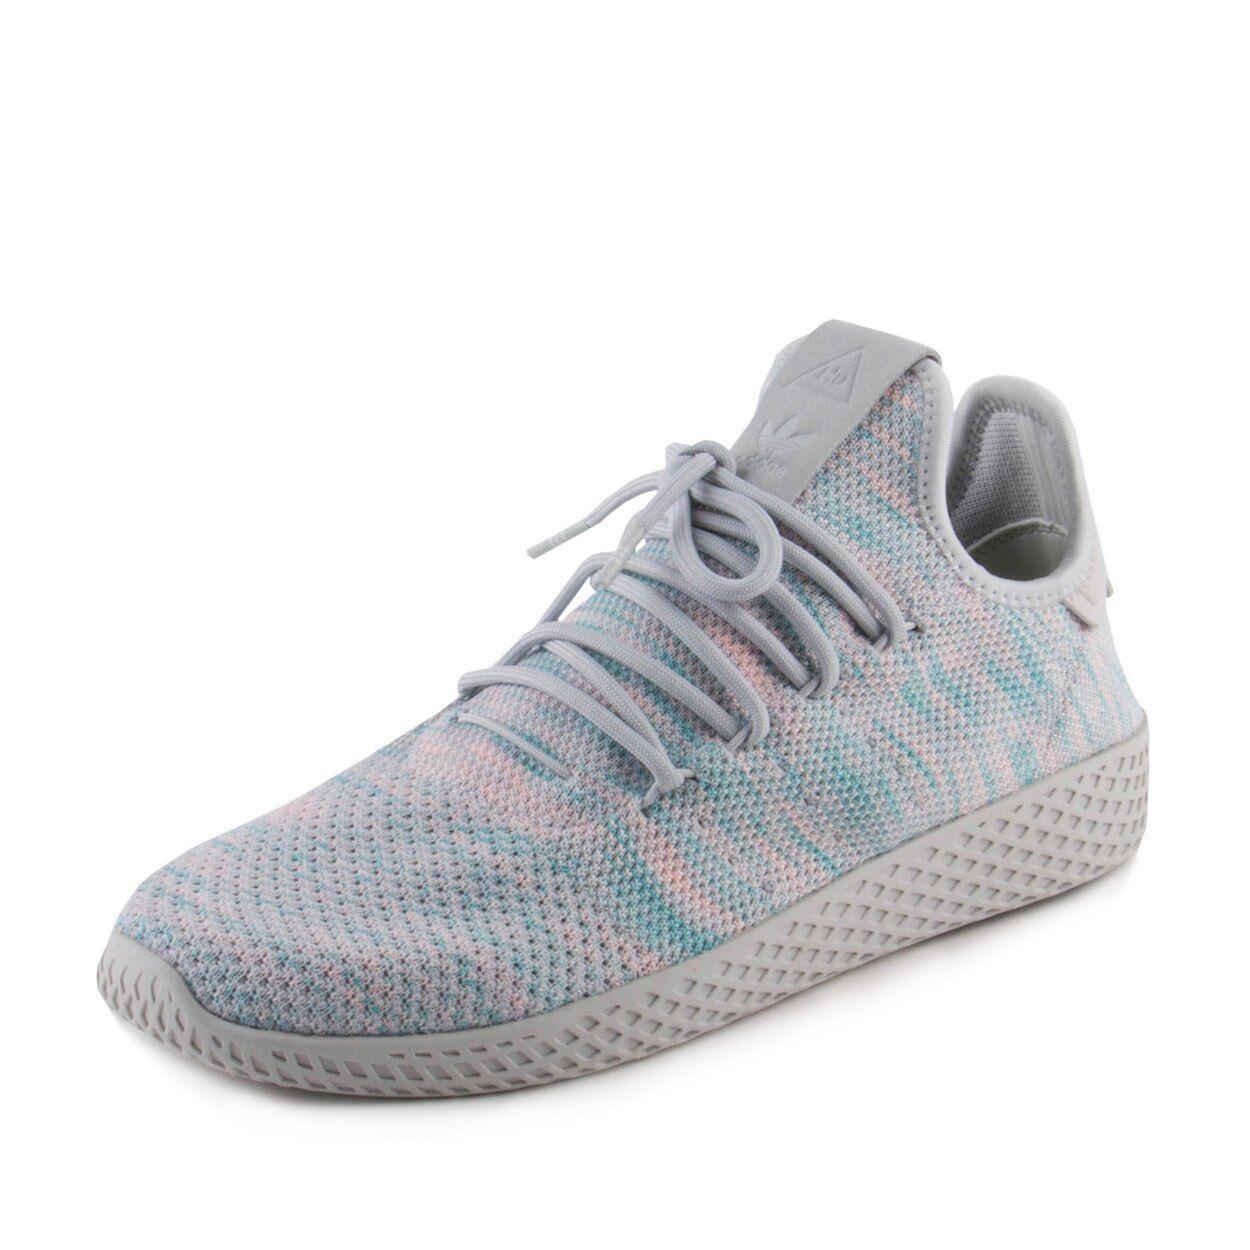 Adidas pharrell williams Uomo tennis hu corsa scarpe da tennis Uomo blu / rosa by2671 dimensioni 10,5 411191